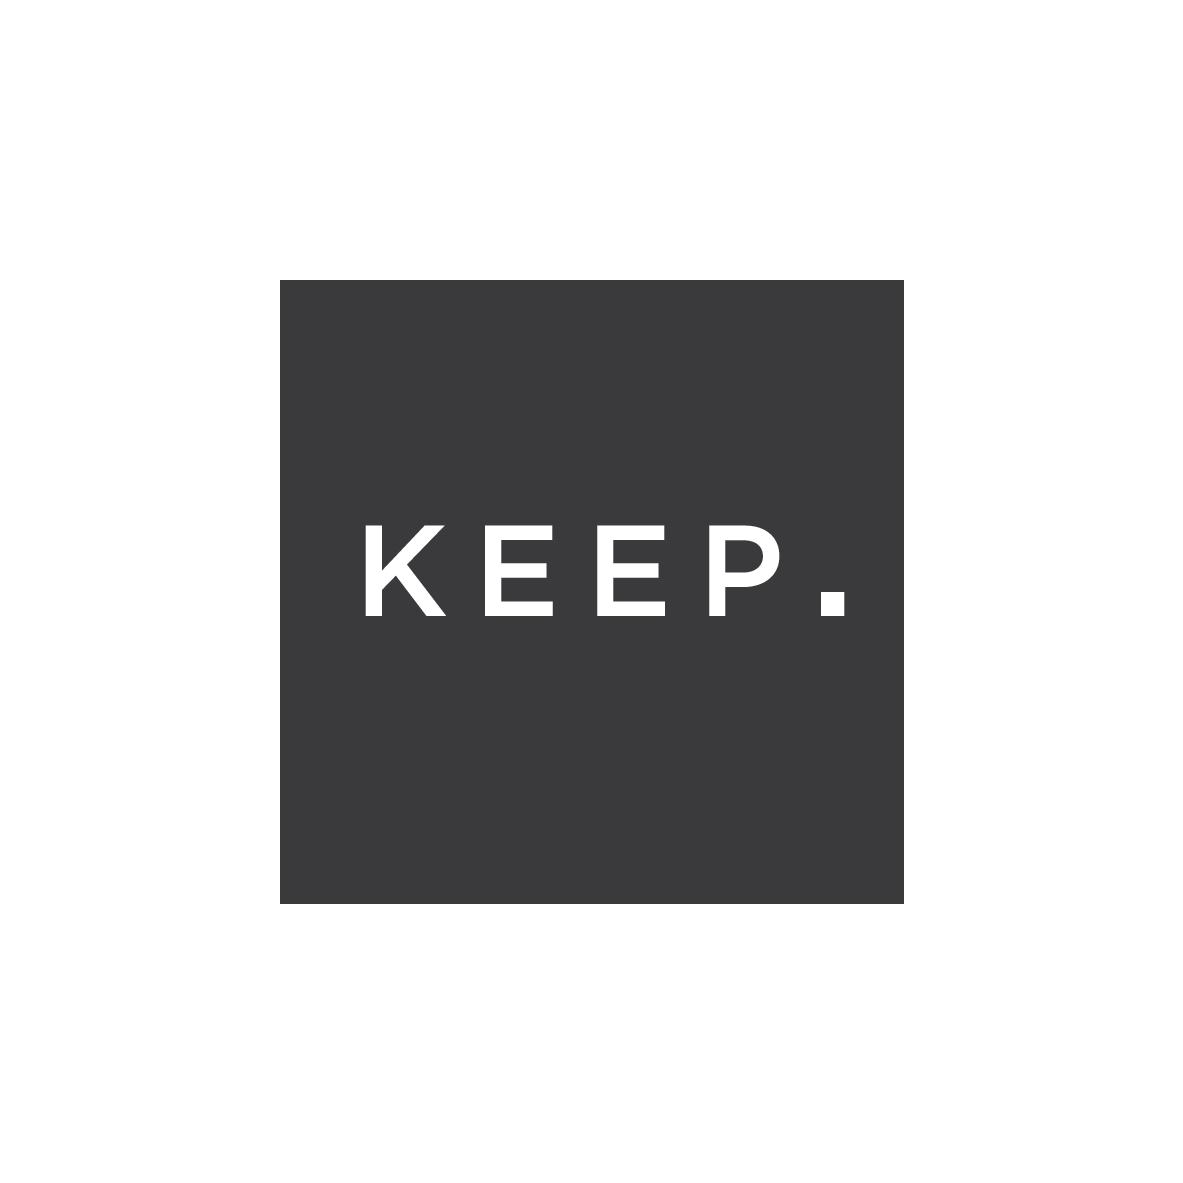 KEEP-slc-logo-01.png